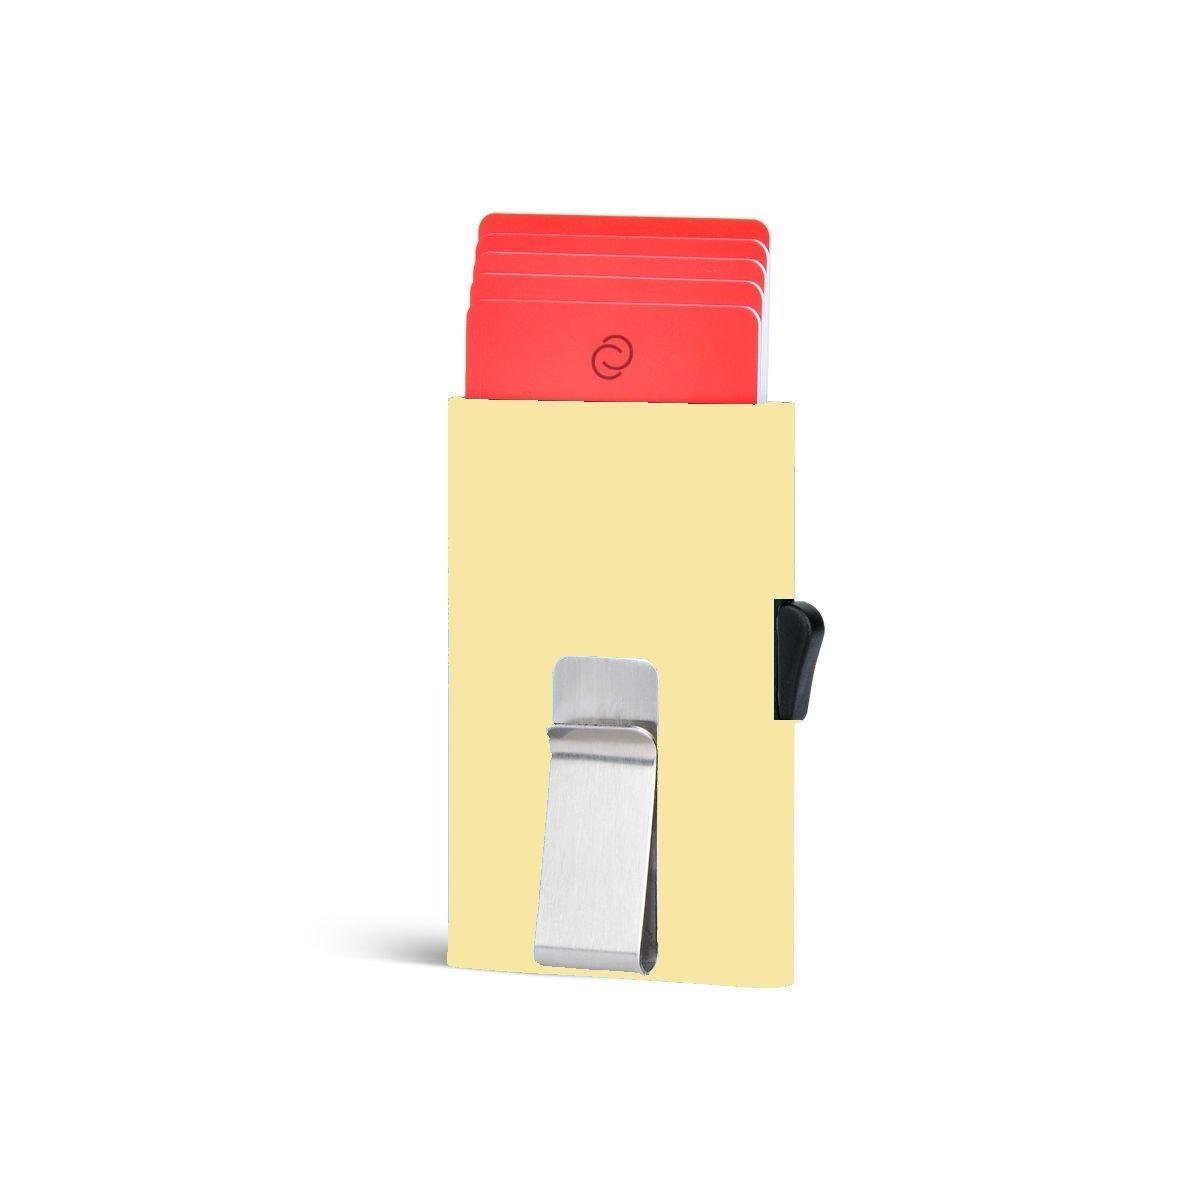 C-Secure ארנק אלומיניום דק בתוספת קליפס - מוזהב